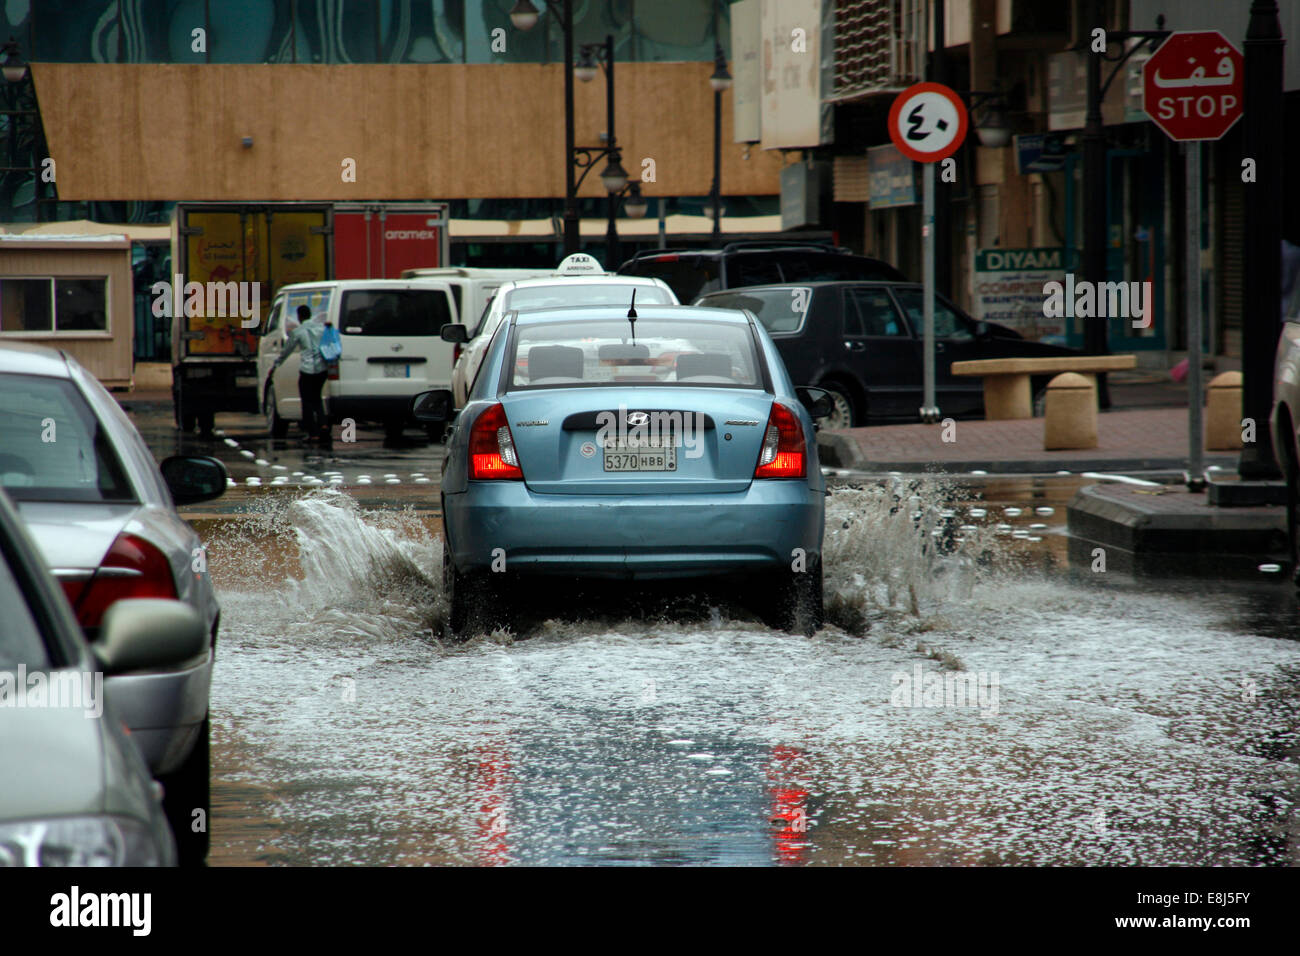 A car drives through the built-up rain water in the streets of Riyadh, Saudi Arabia - Stock Image